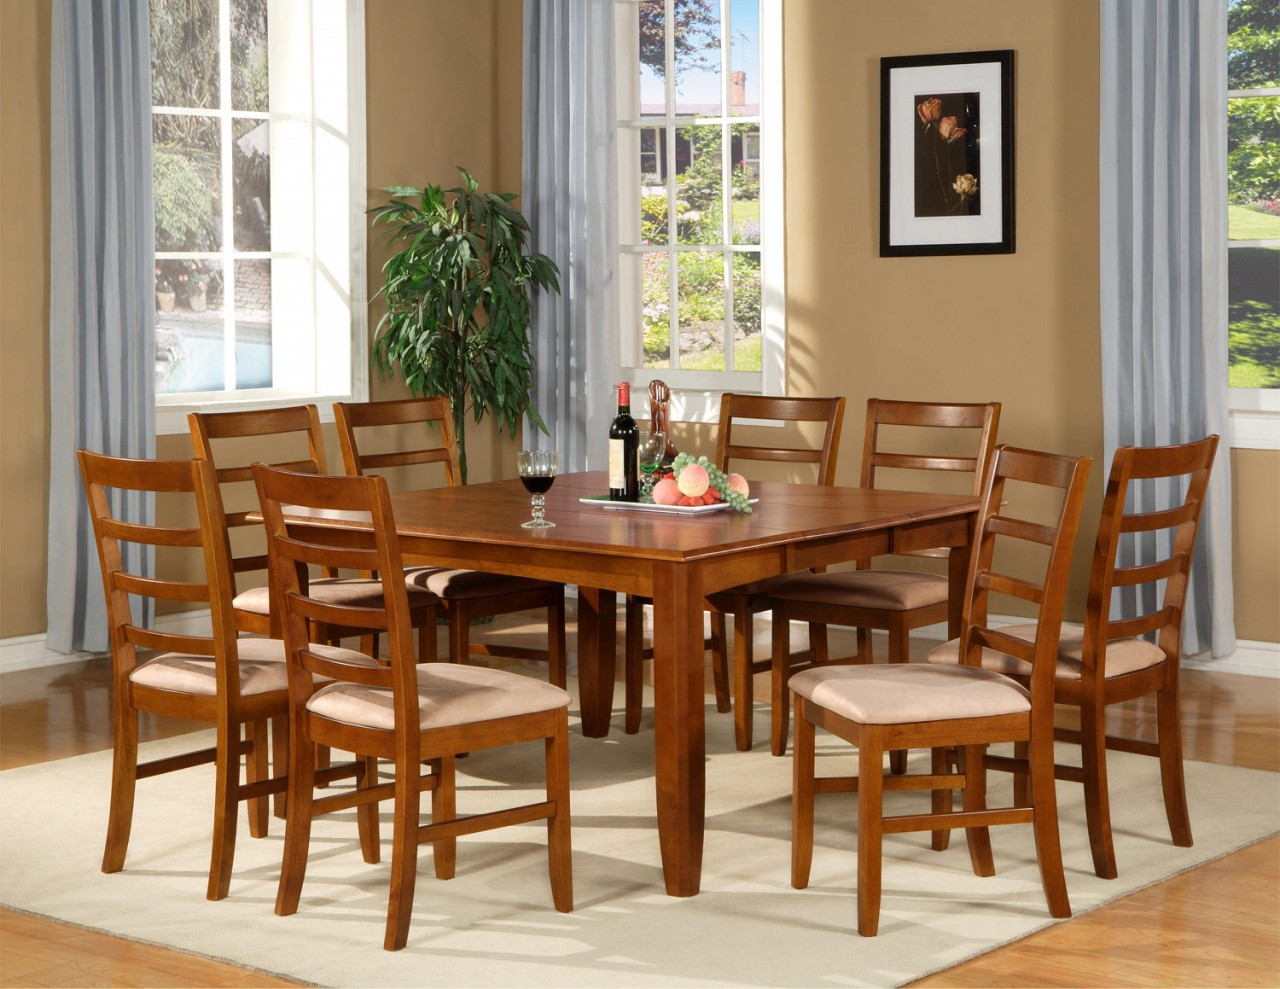 Kitchen dinette chairs Photo - 1